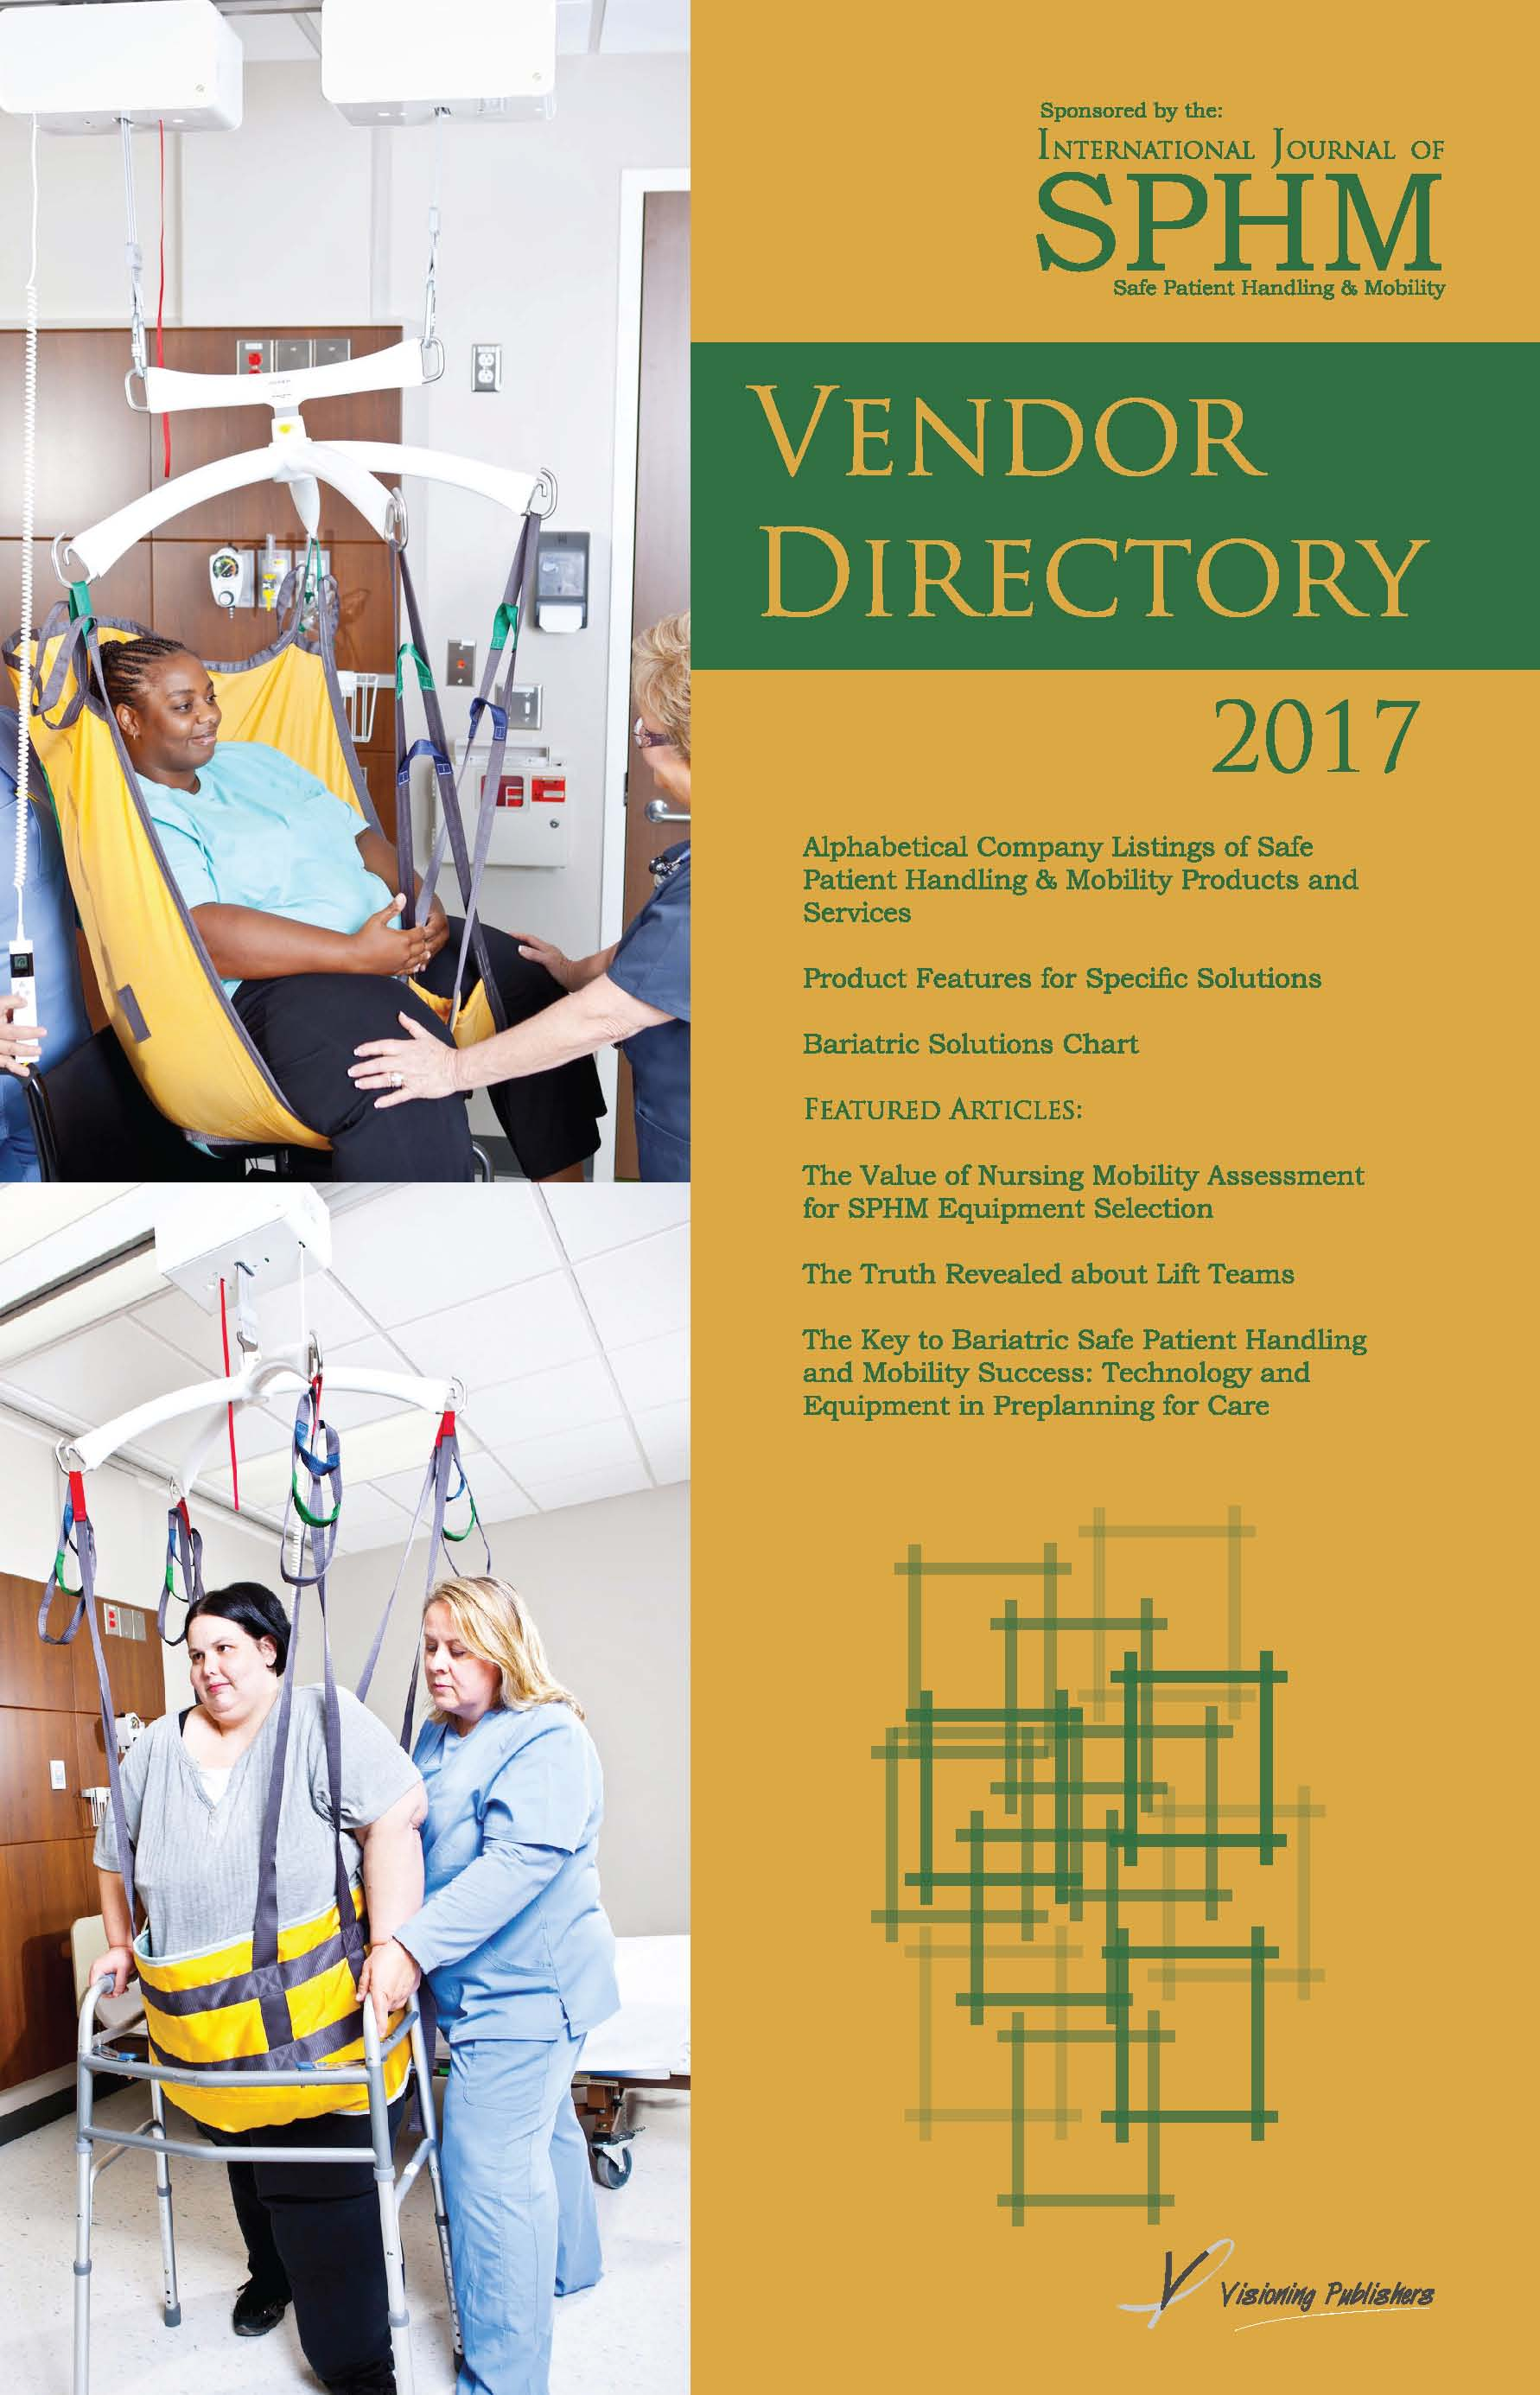 vendor-directory